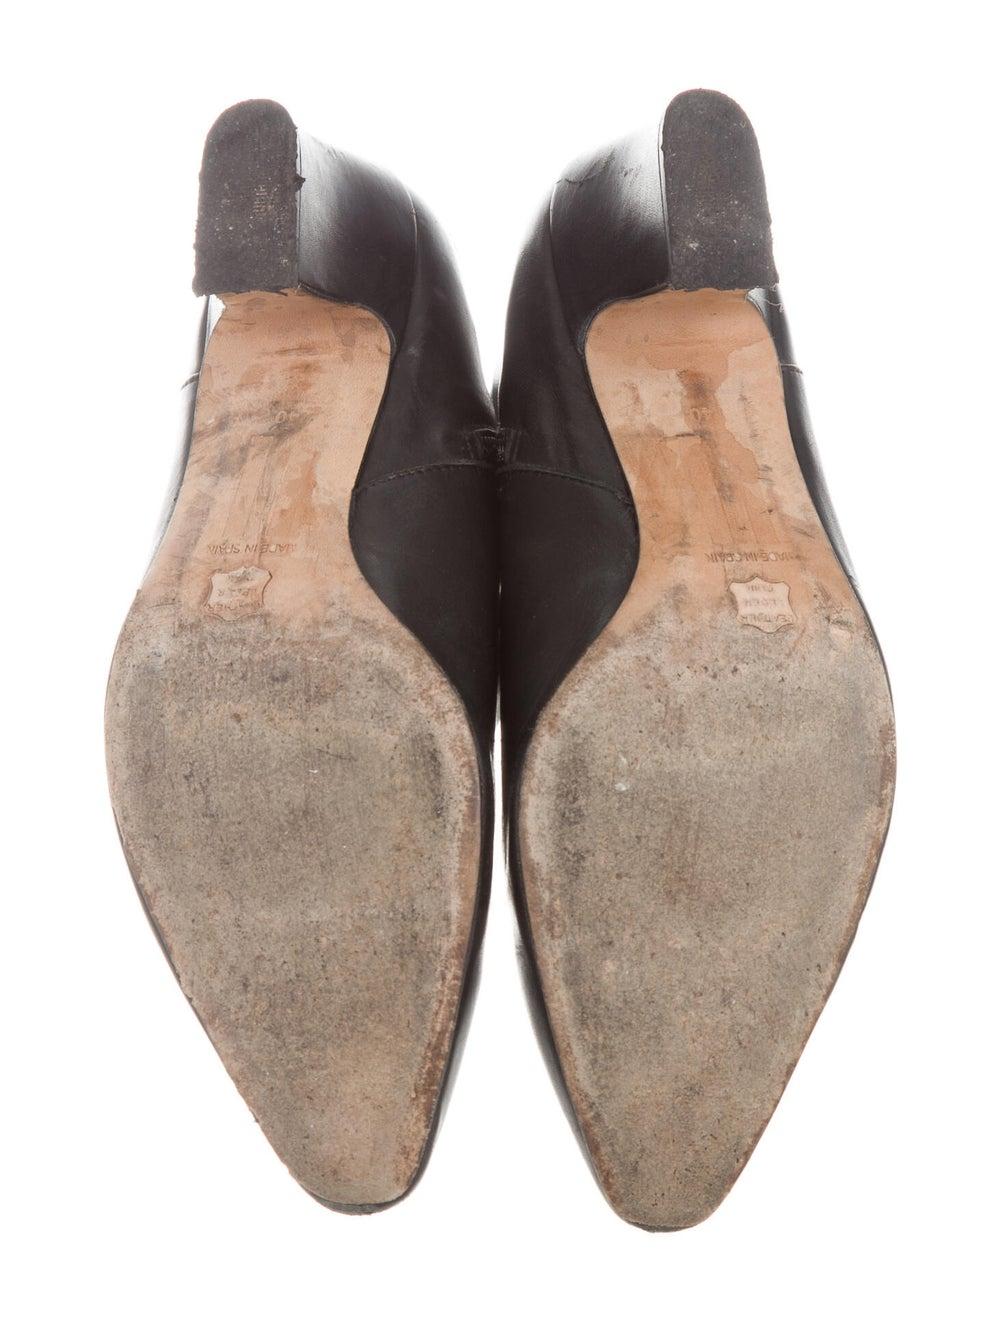 Miista Leather Boots Black - image 5